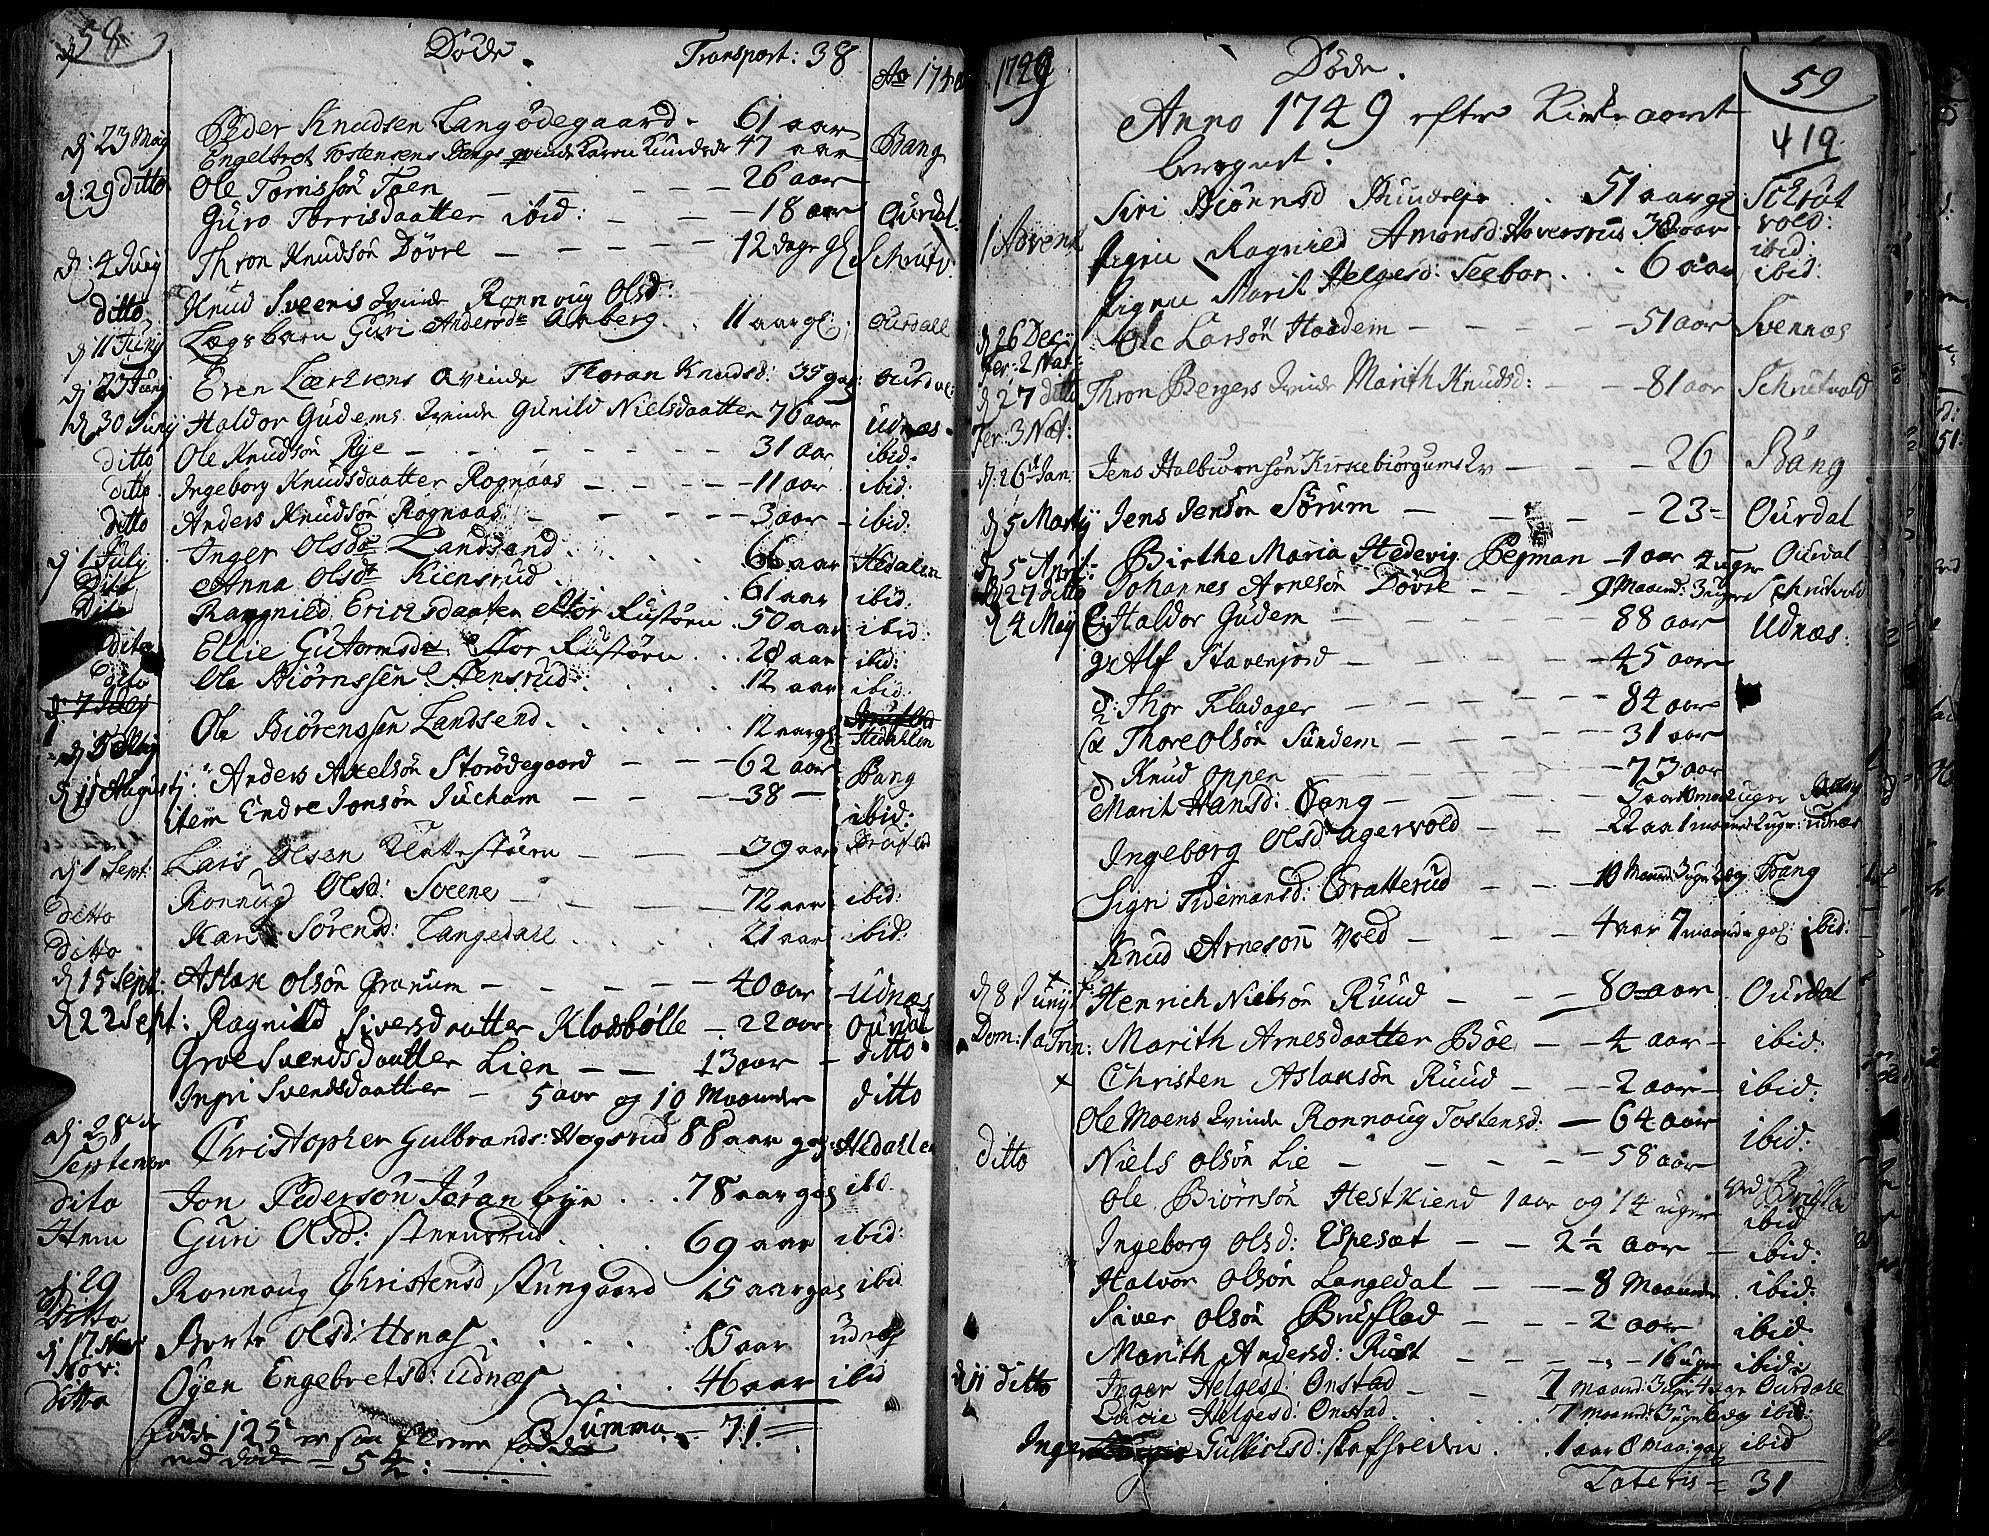 SAH, Aurdal prestekontor, Ministerialbok nr. 4, 1730-1762, s. 58-59